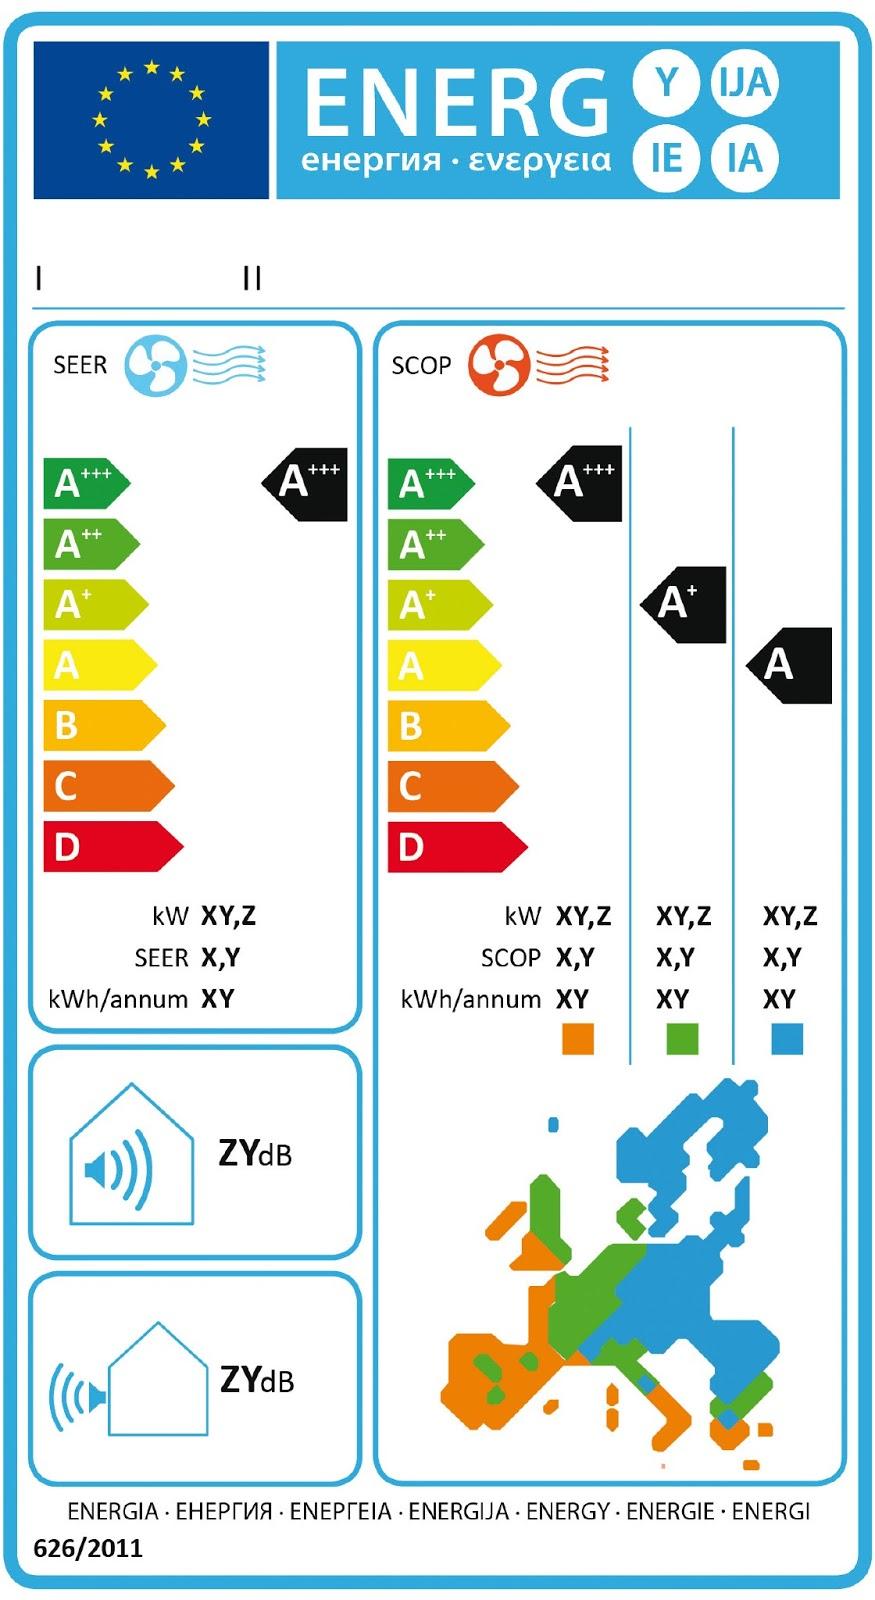 Khoinsa- aire acondicionado- Almería- etiqueta eficiencia energética